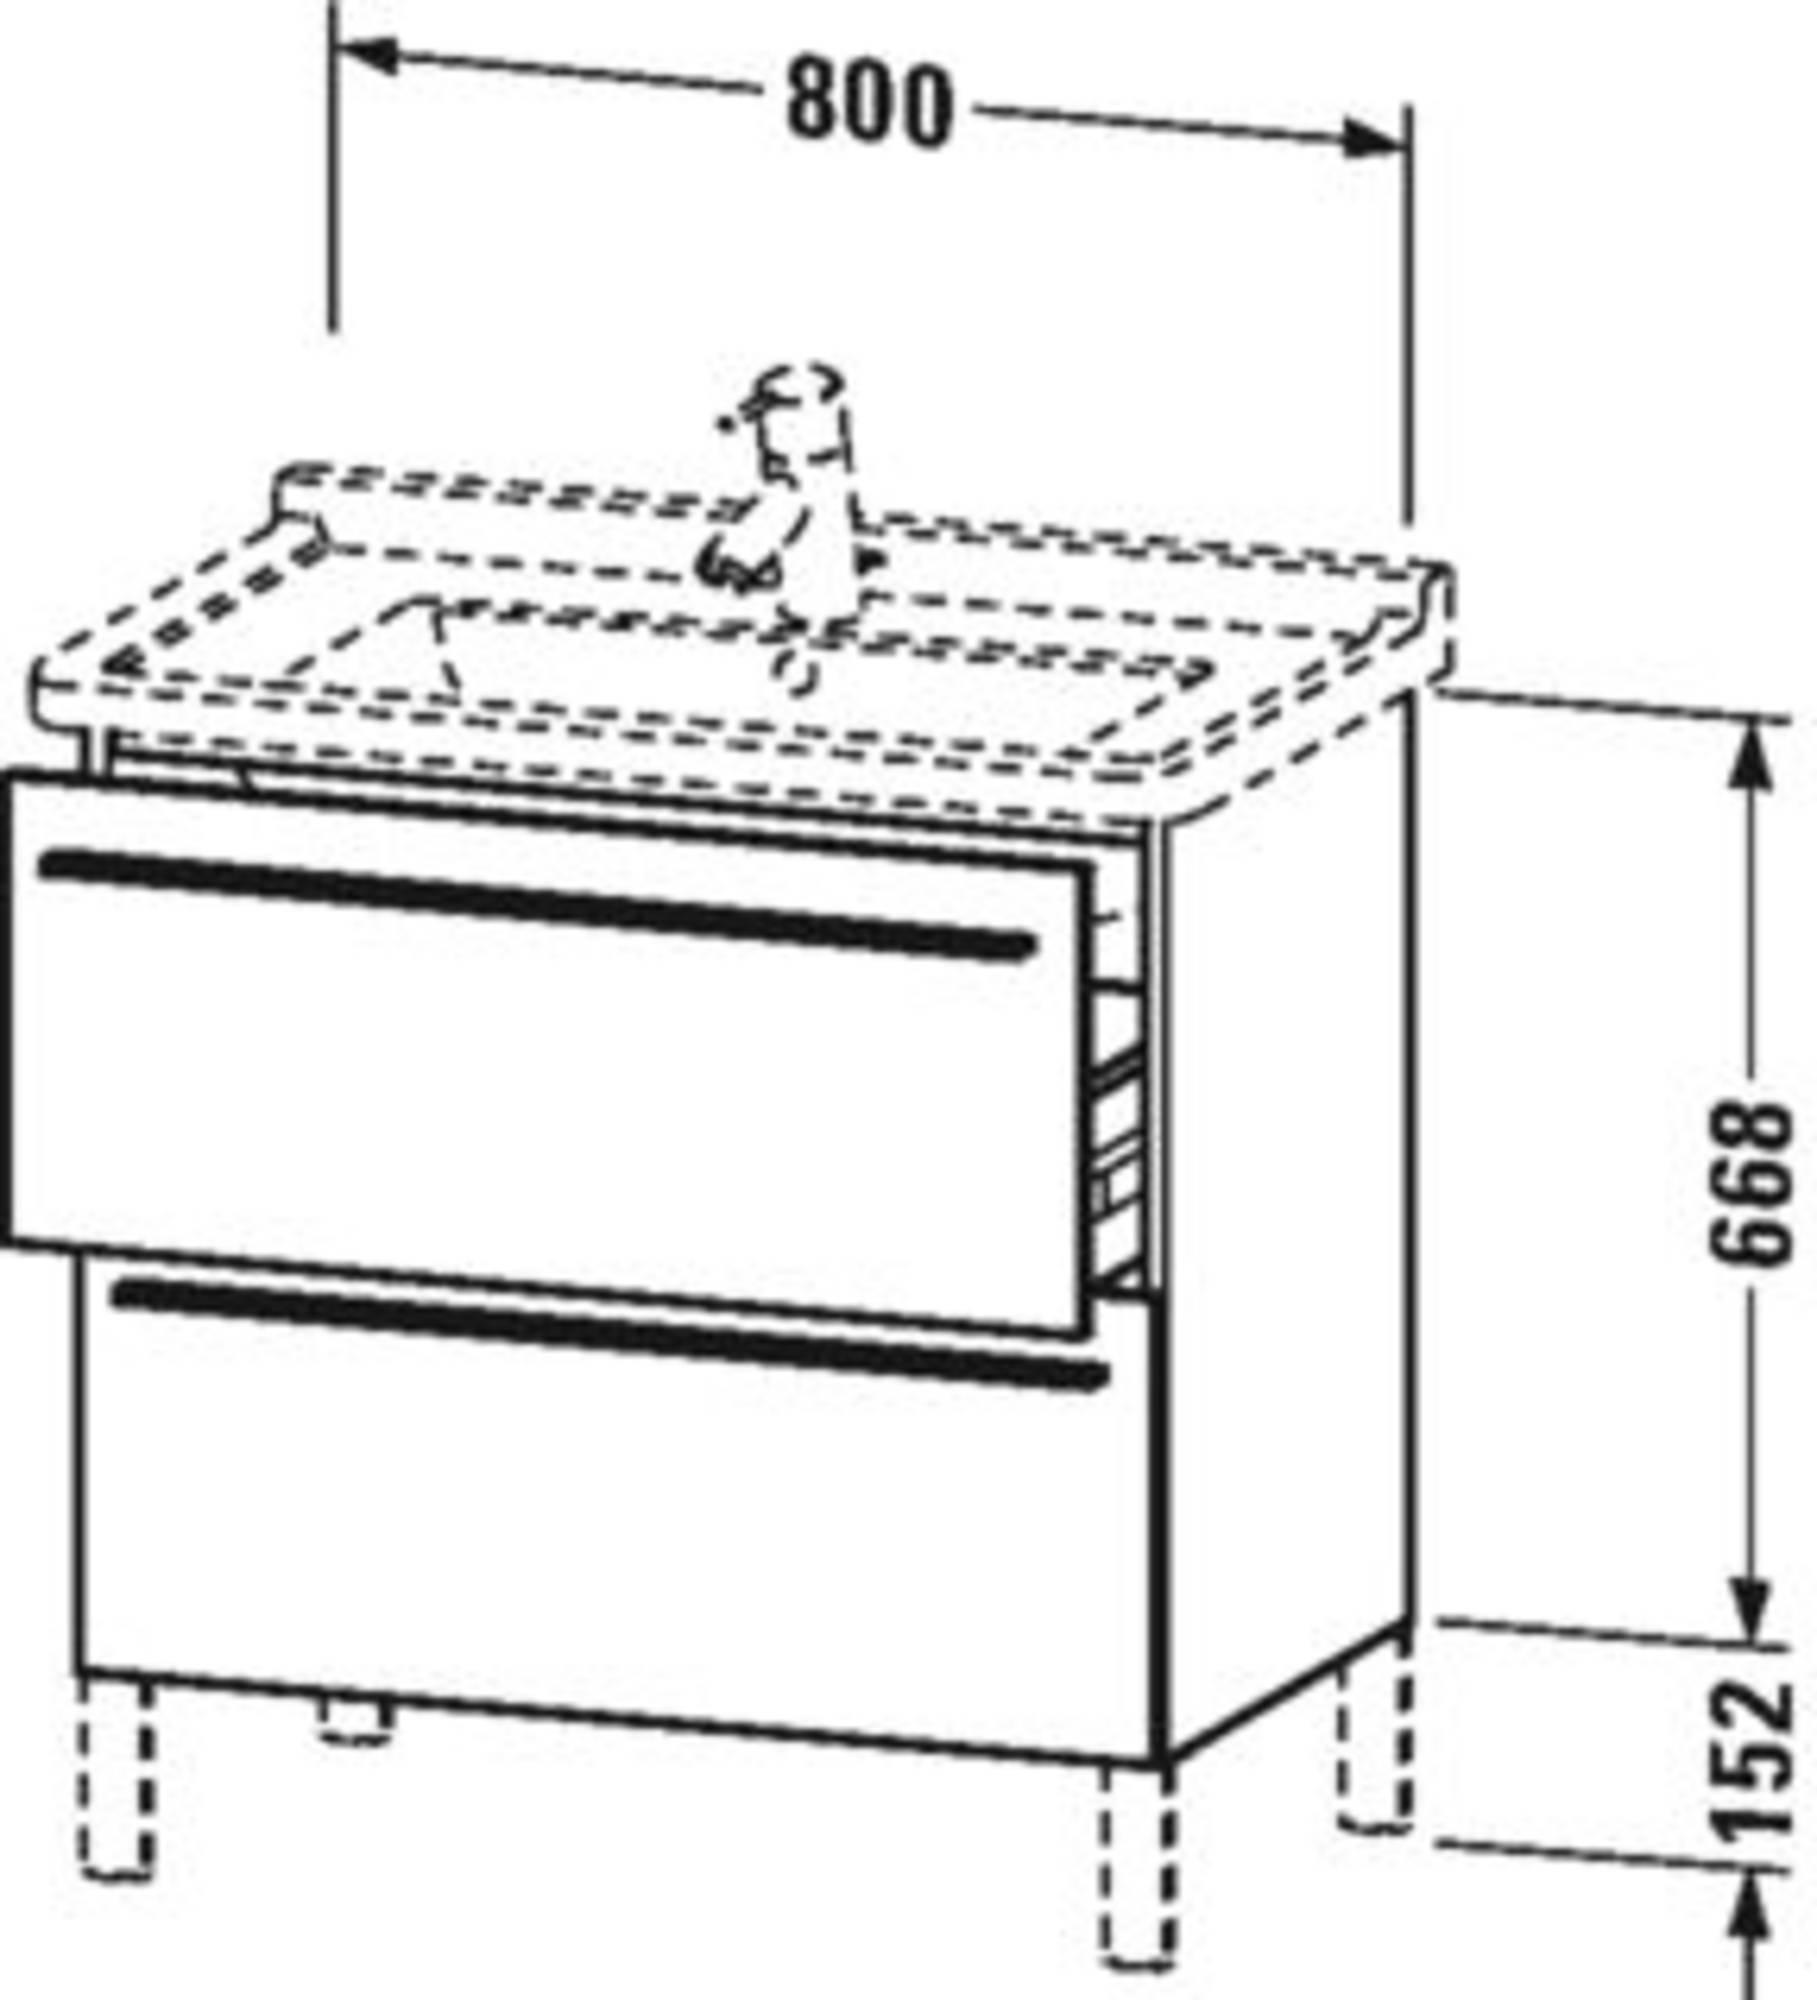 Duravit X-Large wastafelonderkast 2 laden voor Starck 3 80x47x66,8 cm Dolomitri grijs hoogglans